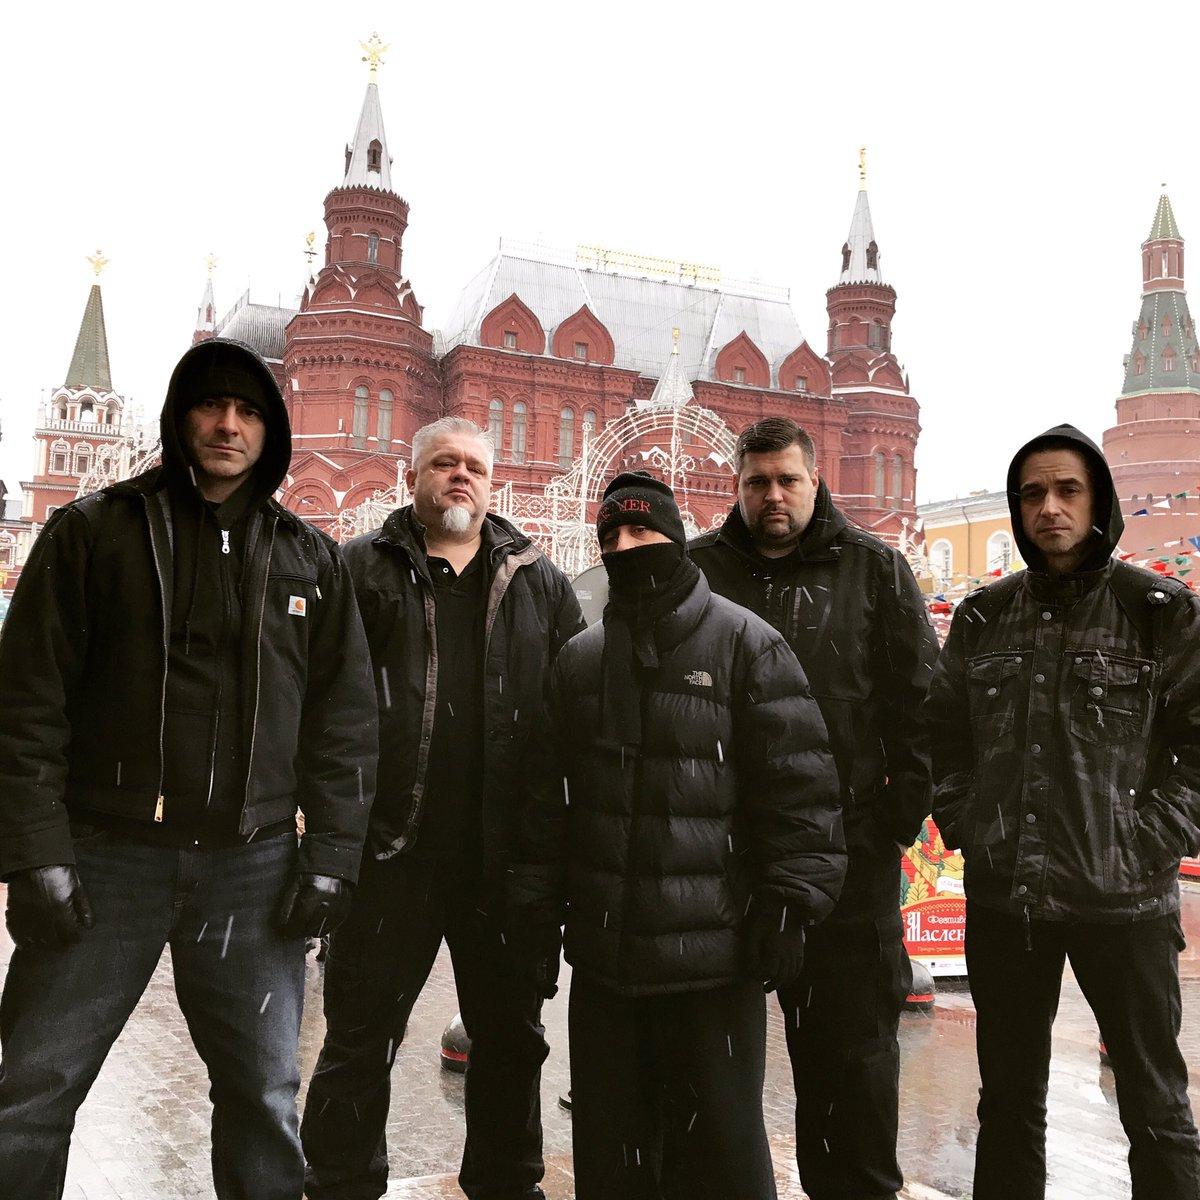 Red Square Rage! #russianrage2017 #thrashmetal #moscow #redsquare #russia #theragingti ...